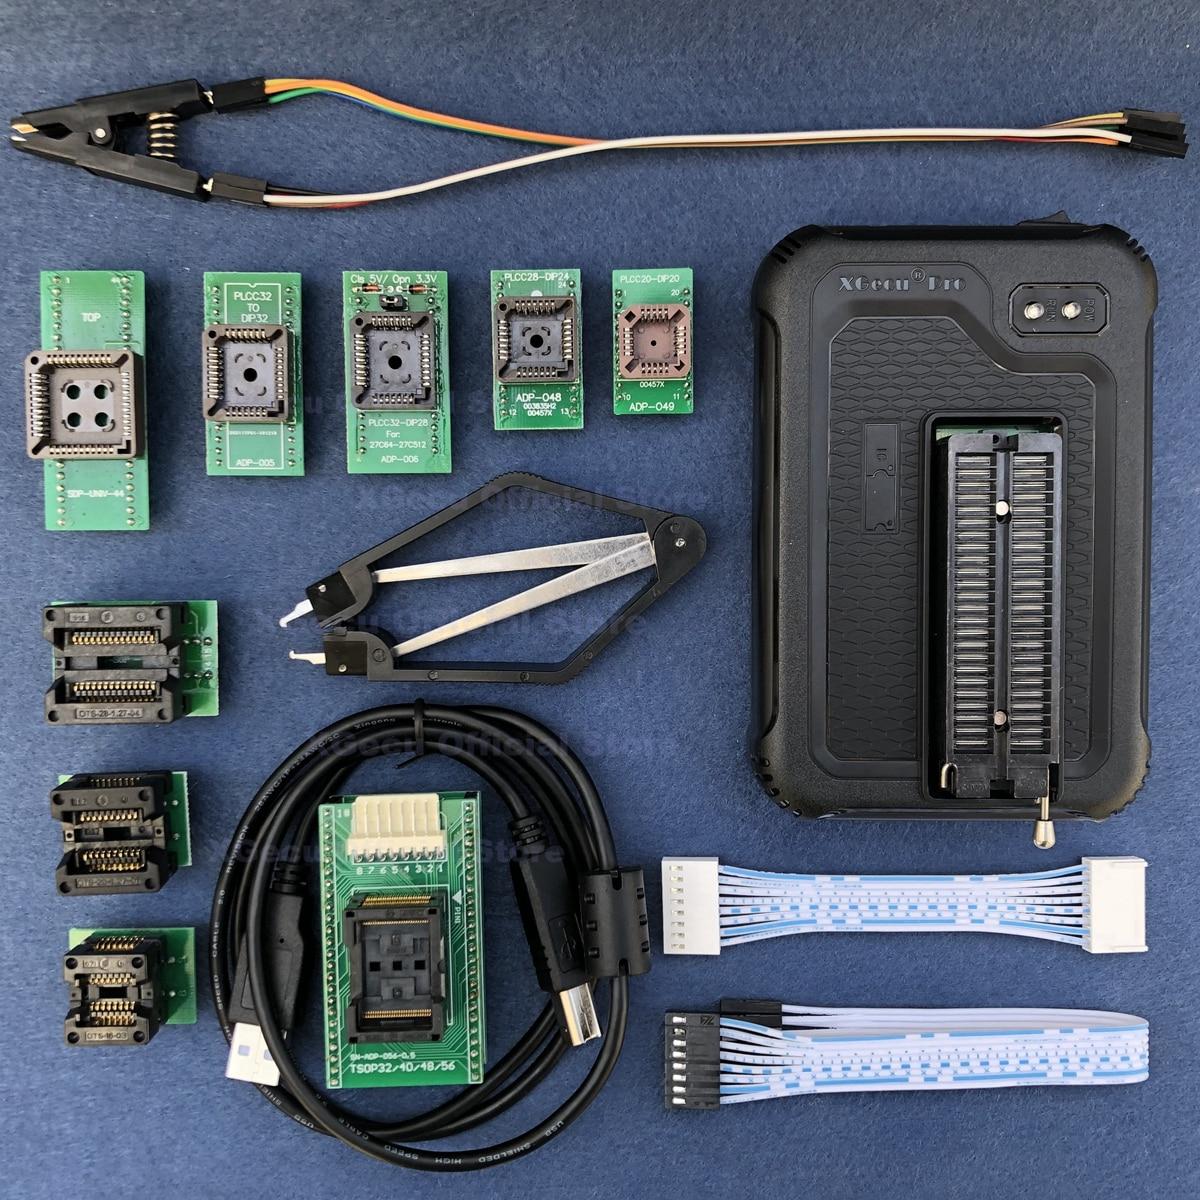 XGecu T56 USB Programmer 56 Pin Drivers Support 20000+ ICs For PIC/NAND Flash/EMMC TSOP48/TSOP56/BGA+ 9 Adapters+soic8 Test Clip